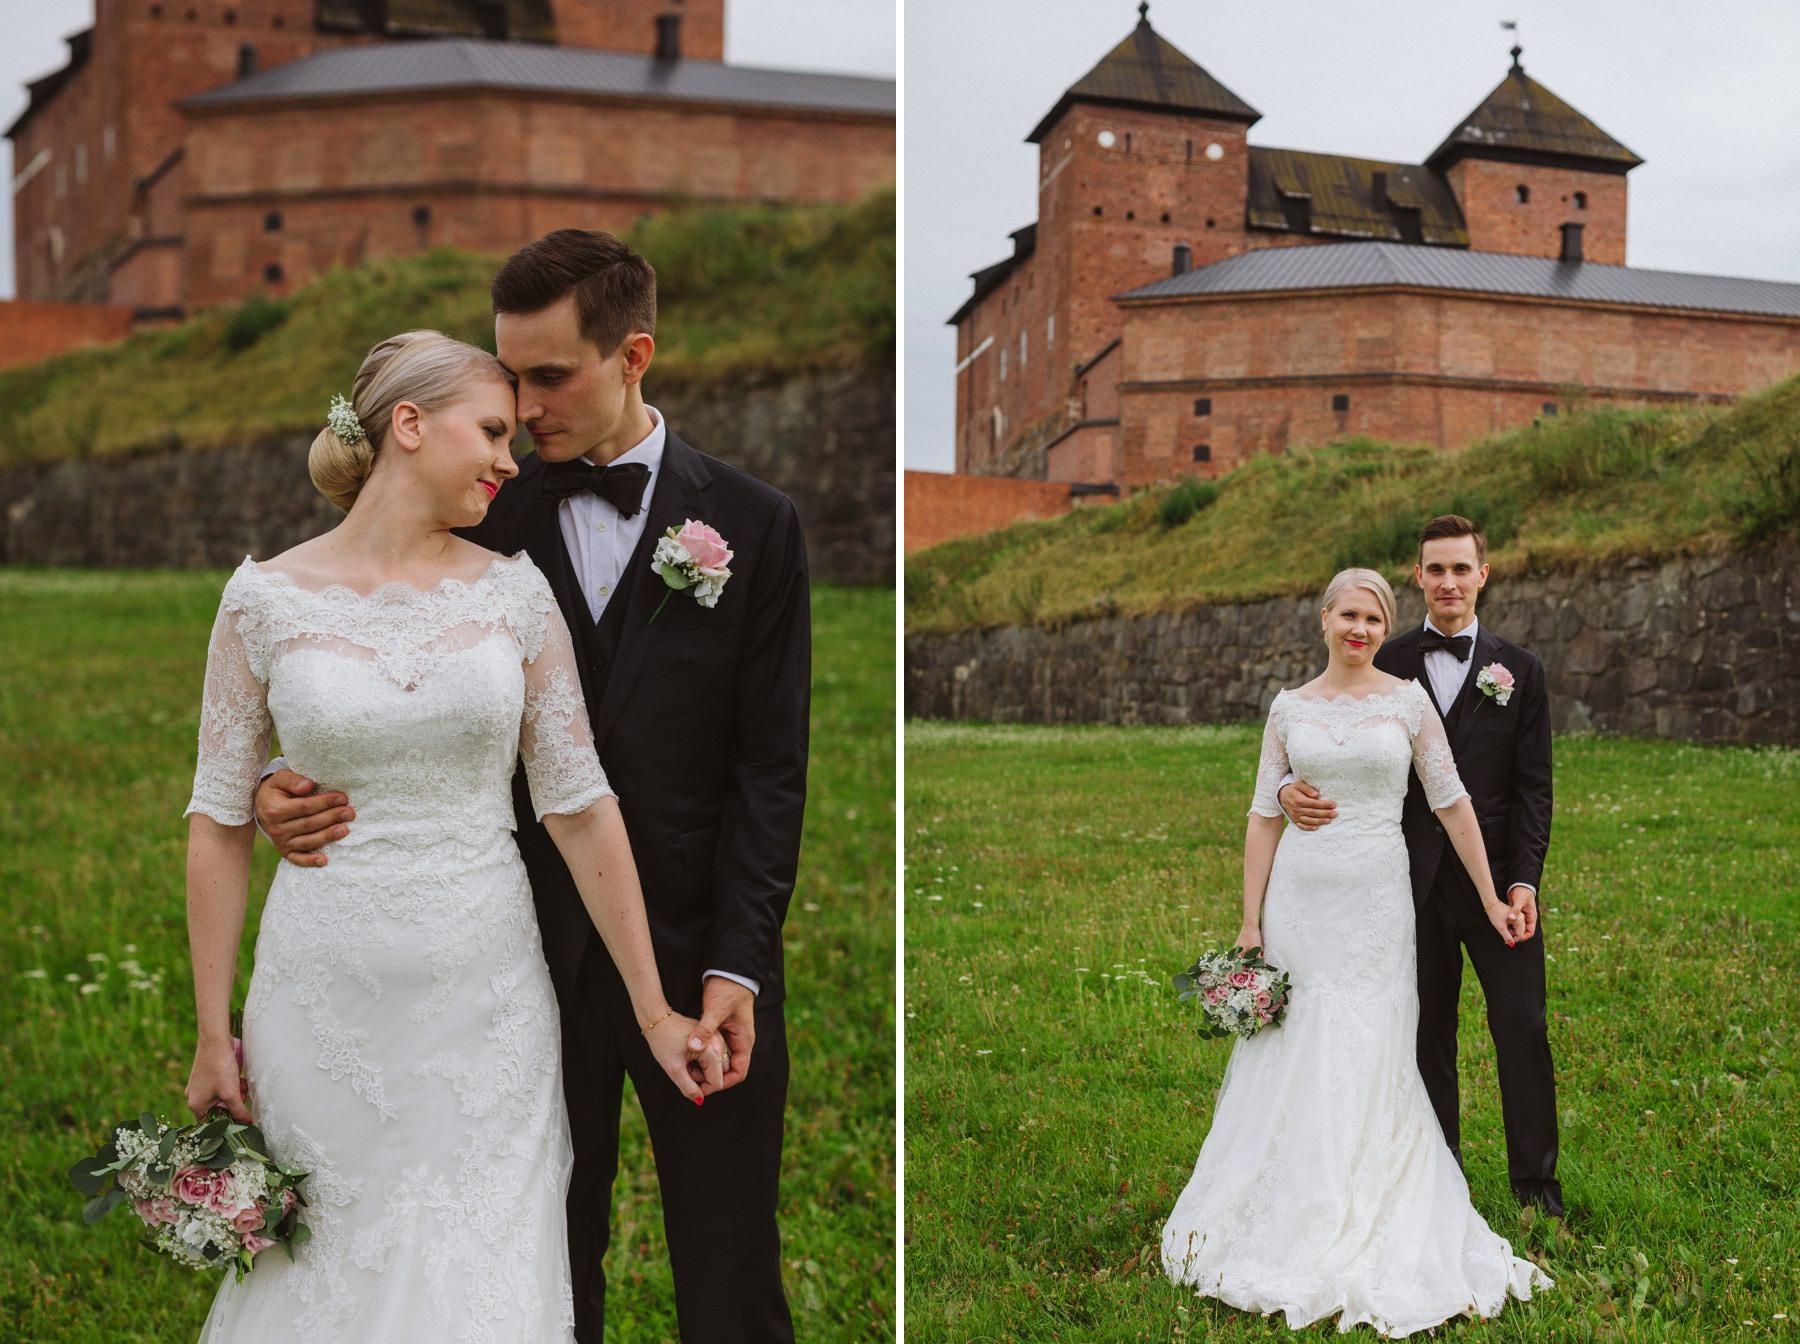 Hämeenlinnassa avioliitto